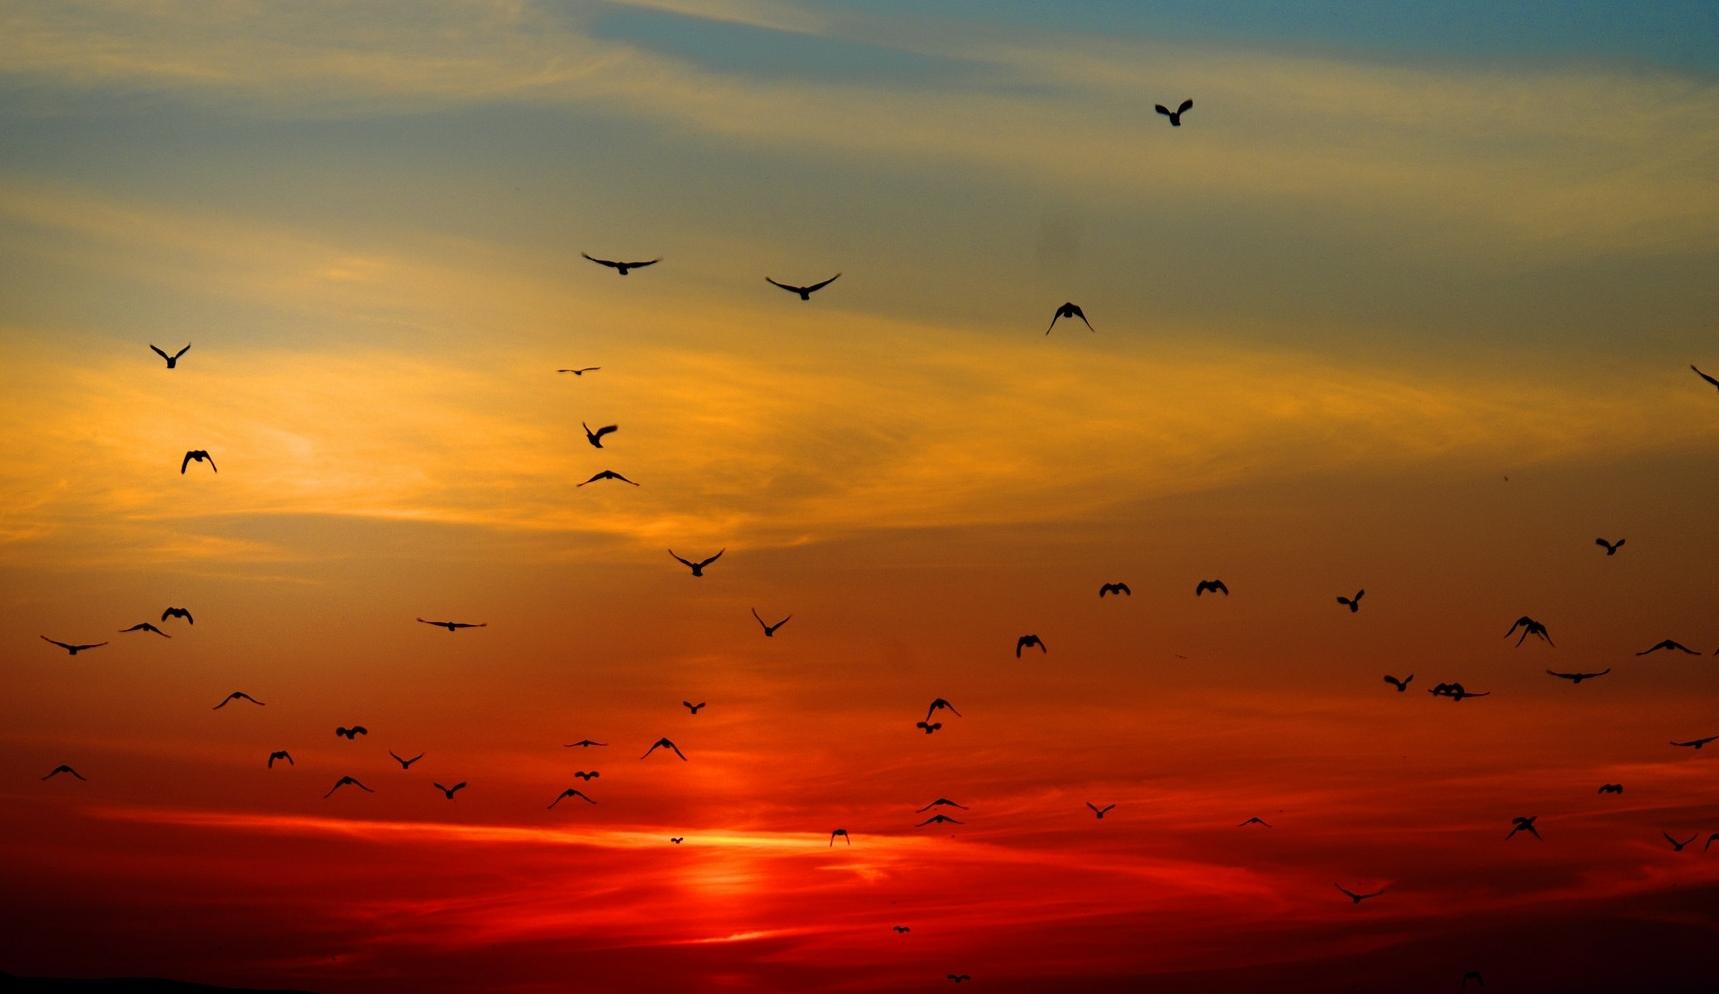 sunset-100367_1920.jpg